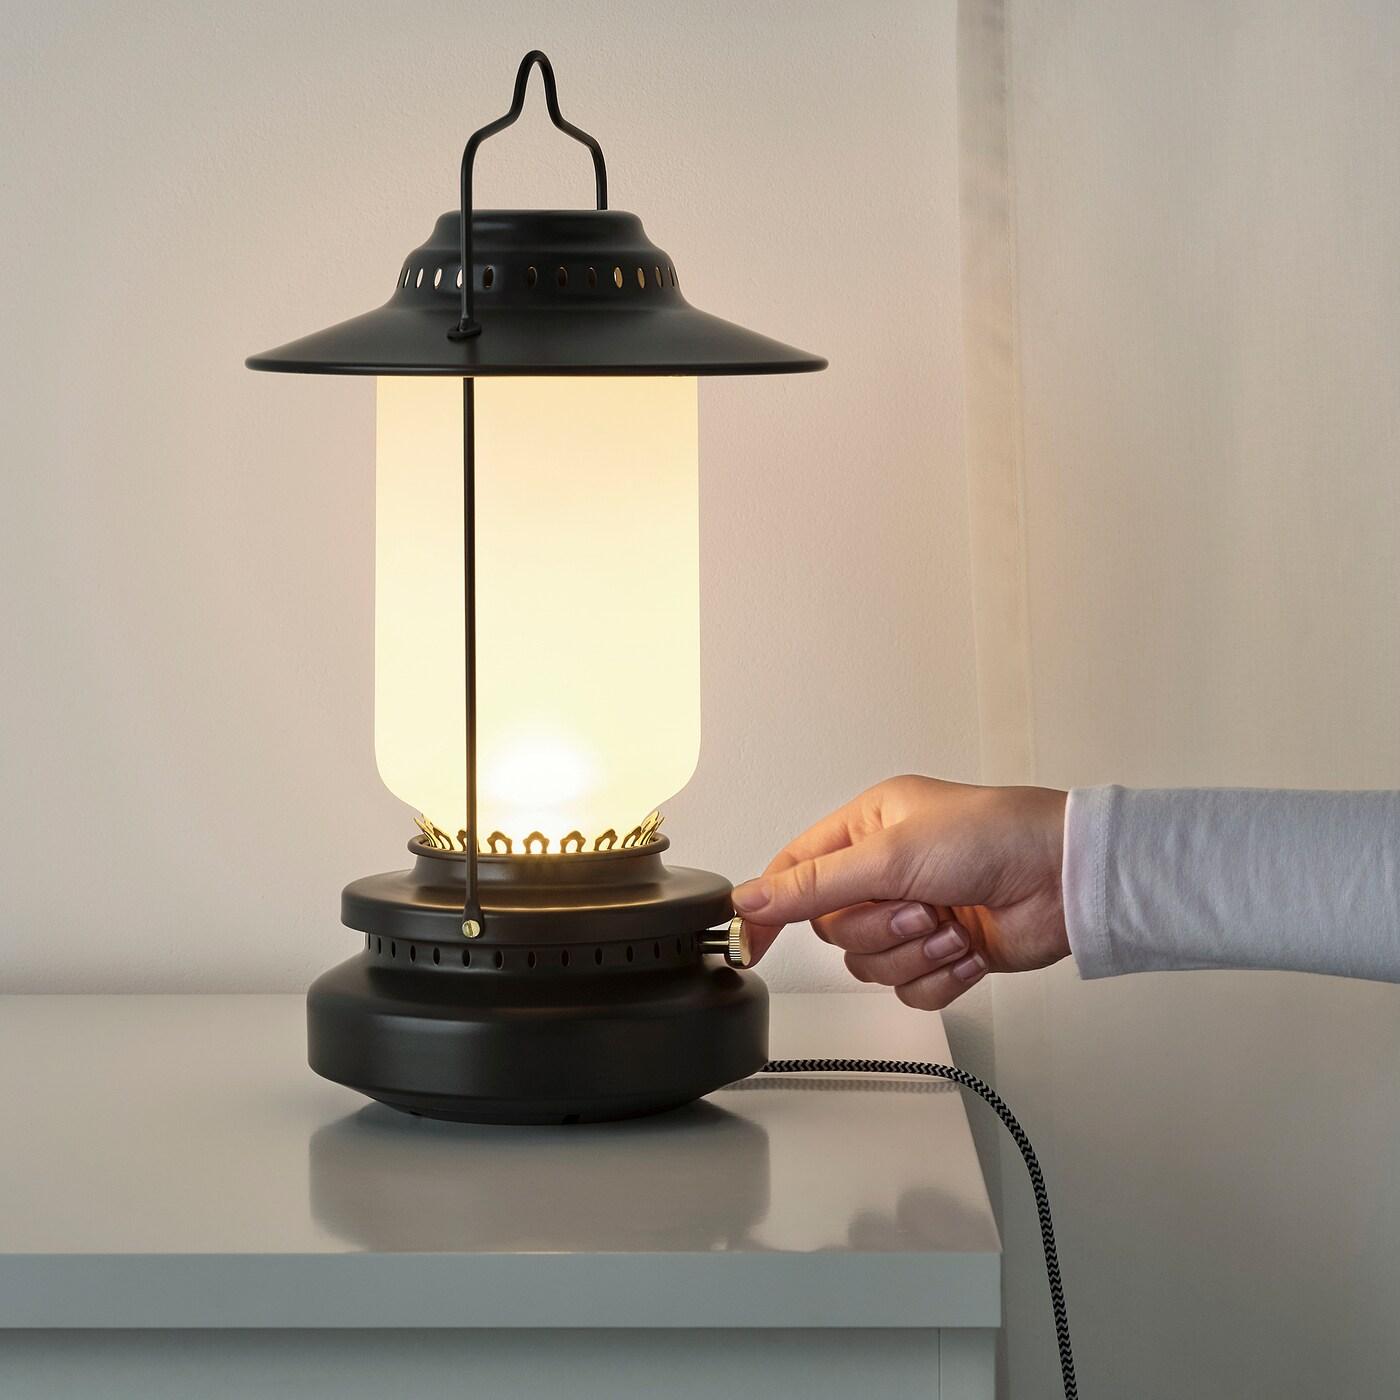 Storhaga Lampe De Table A Led Intensite Lumineuse Reglable Exterieur Noir 35 Cm Ikea